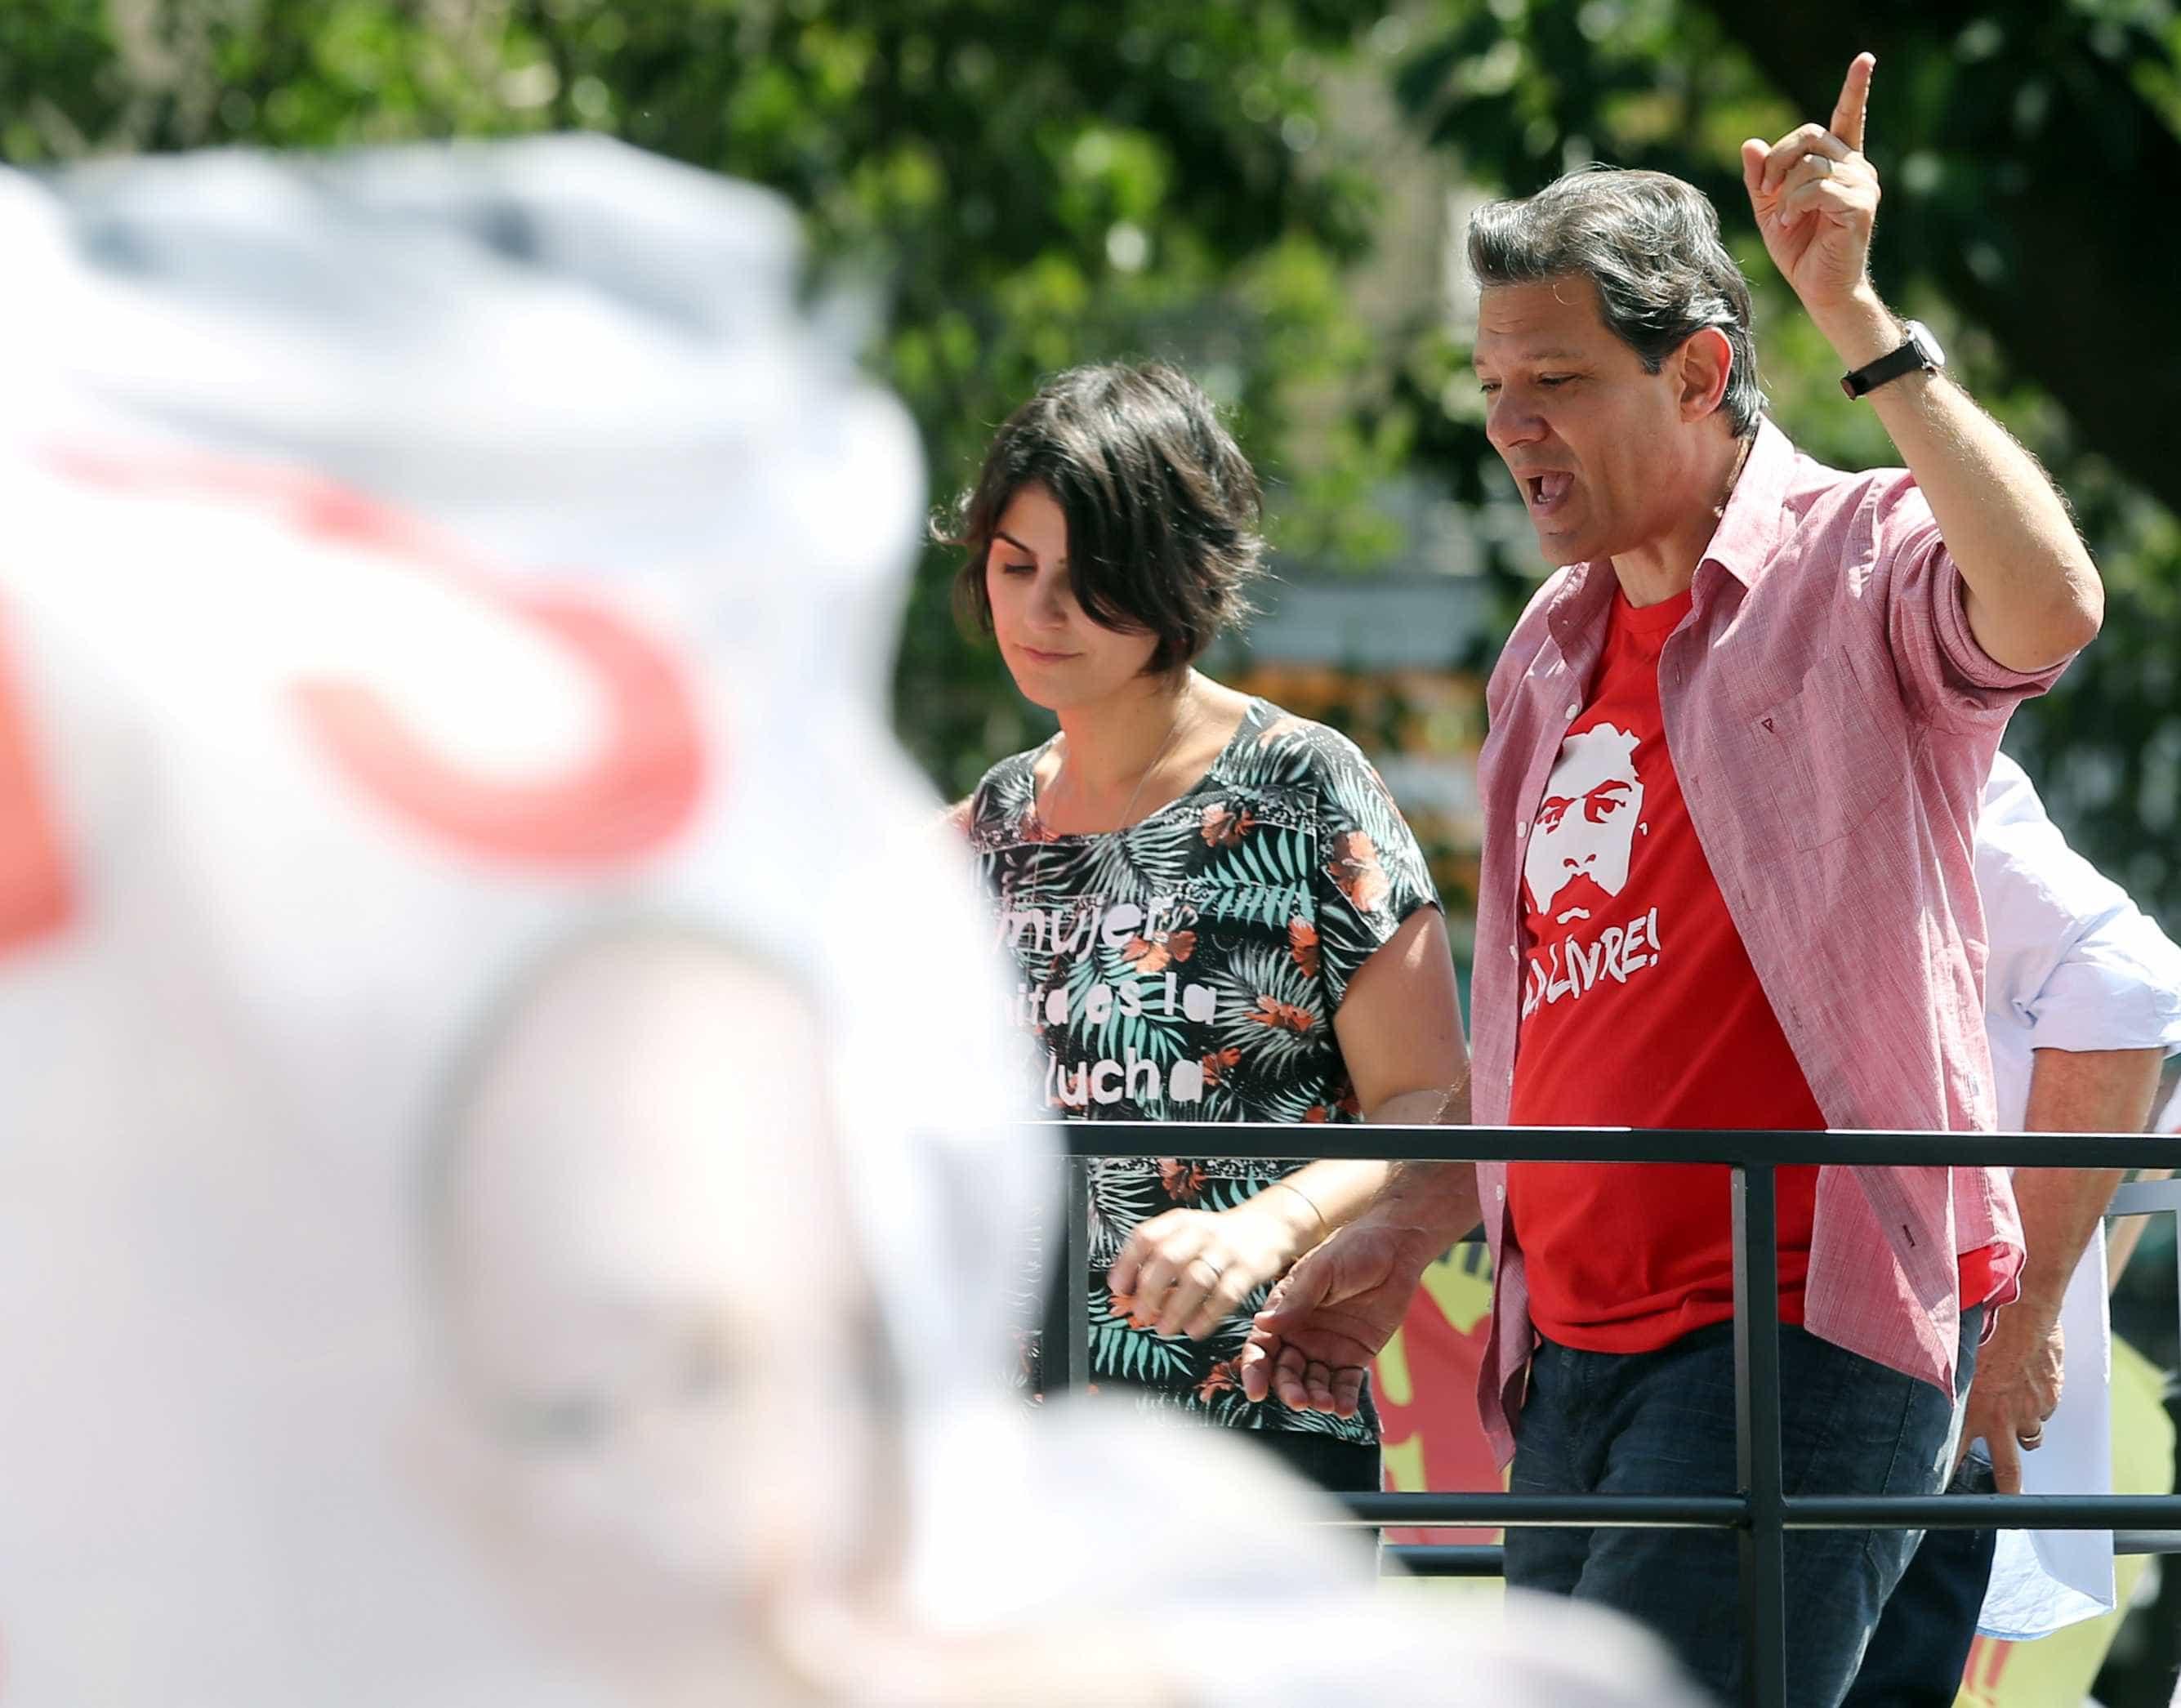 Campanha de Haddad resgata apelido dado por militares a Bolsonaro